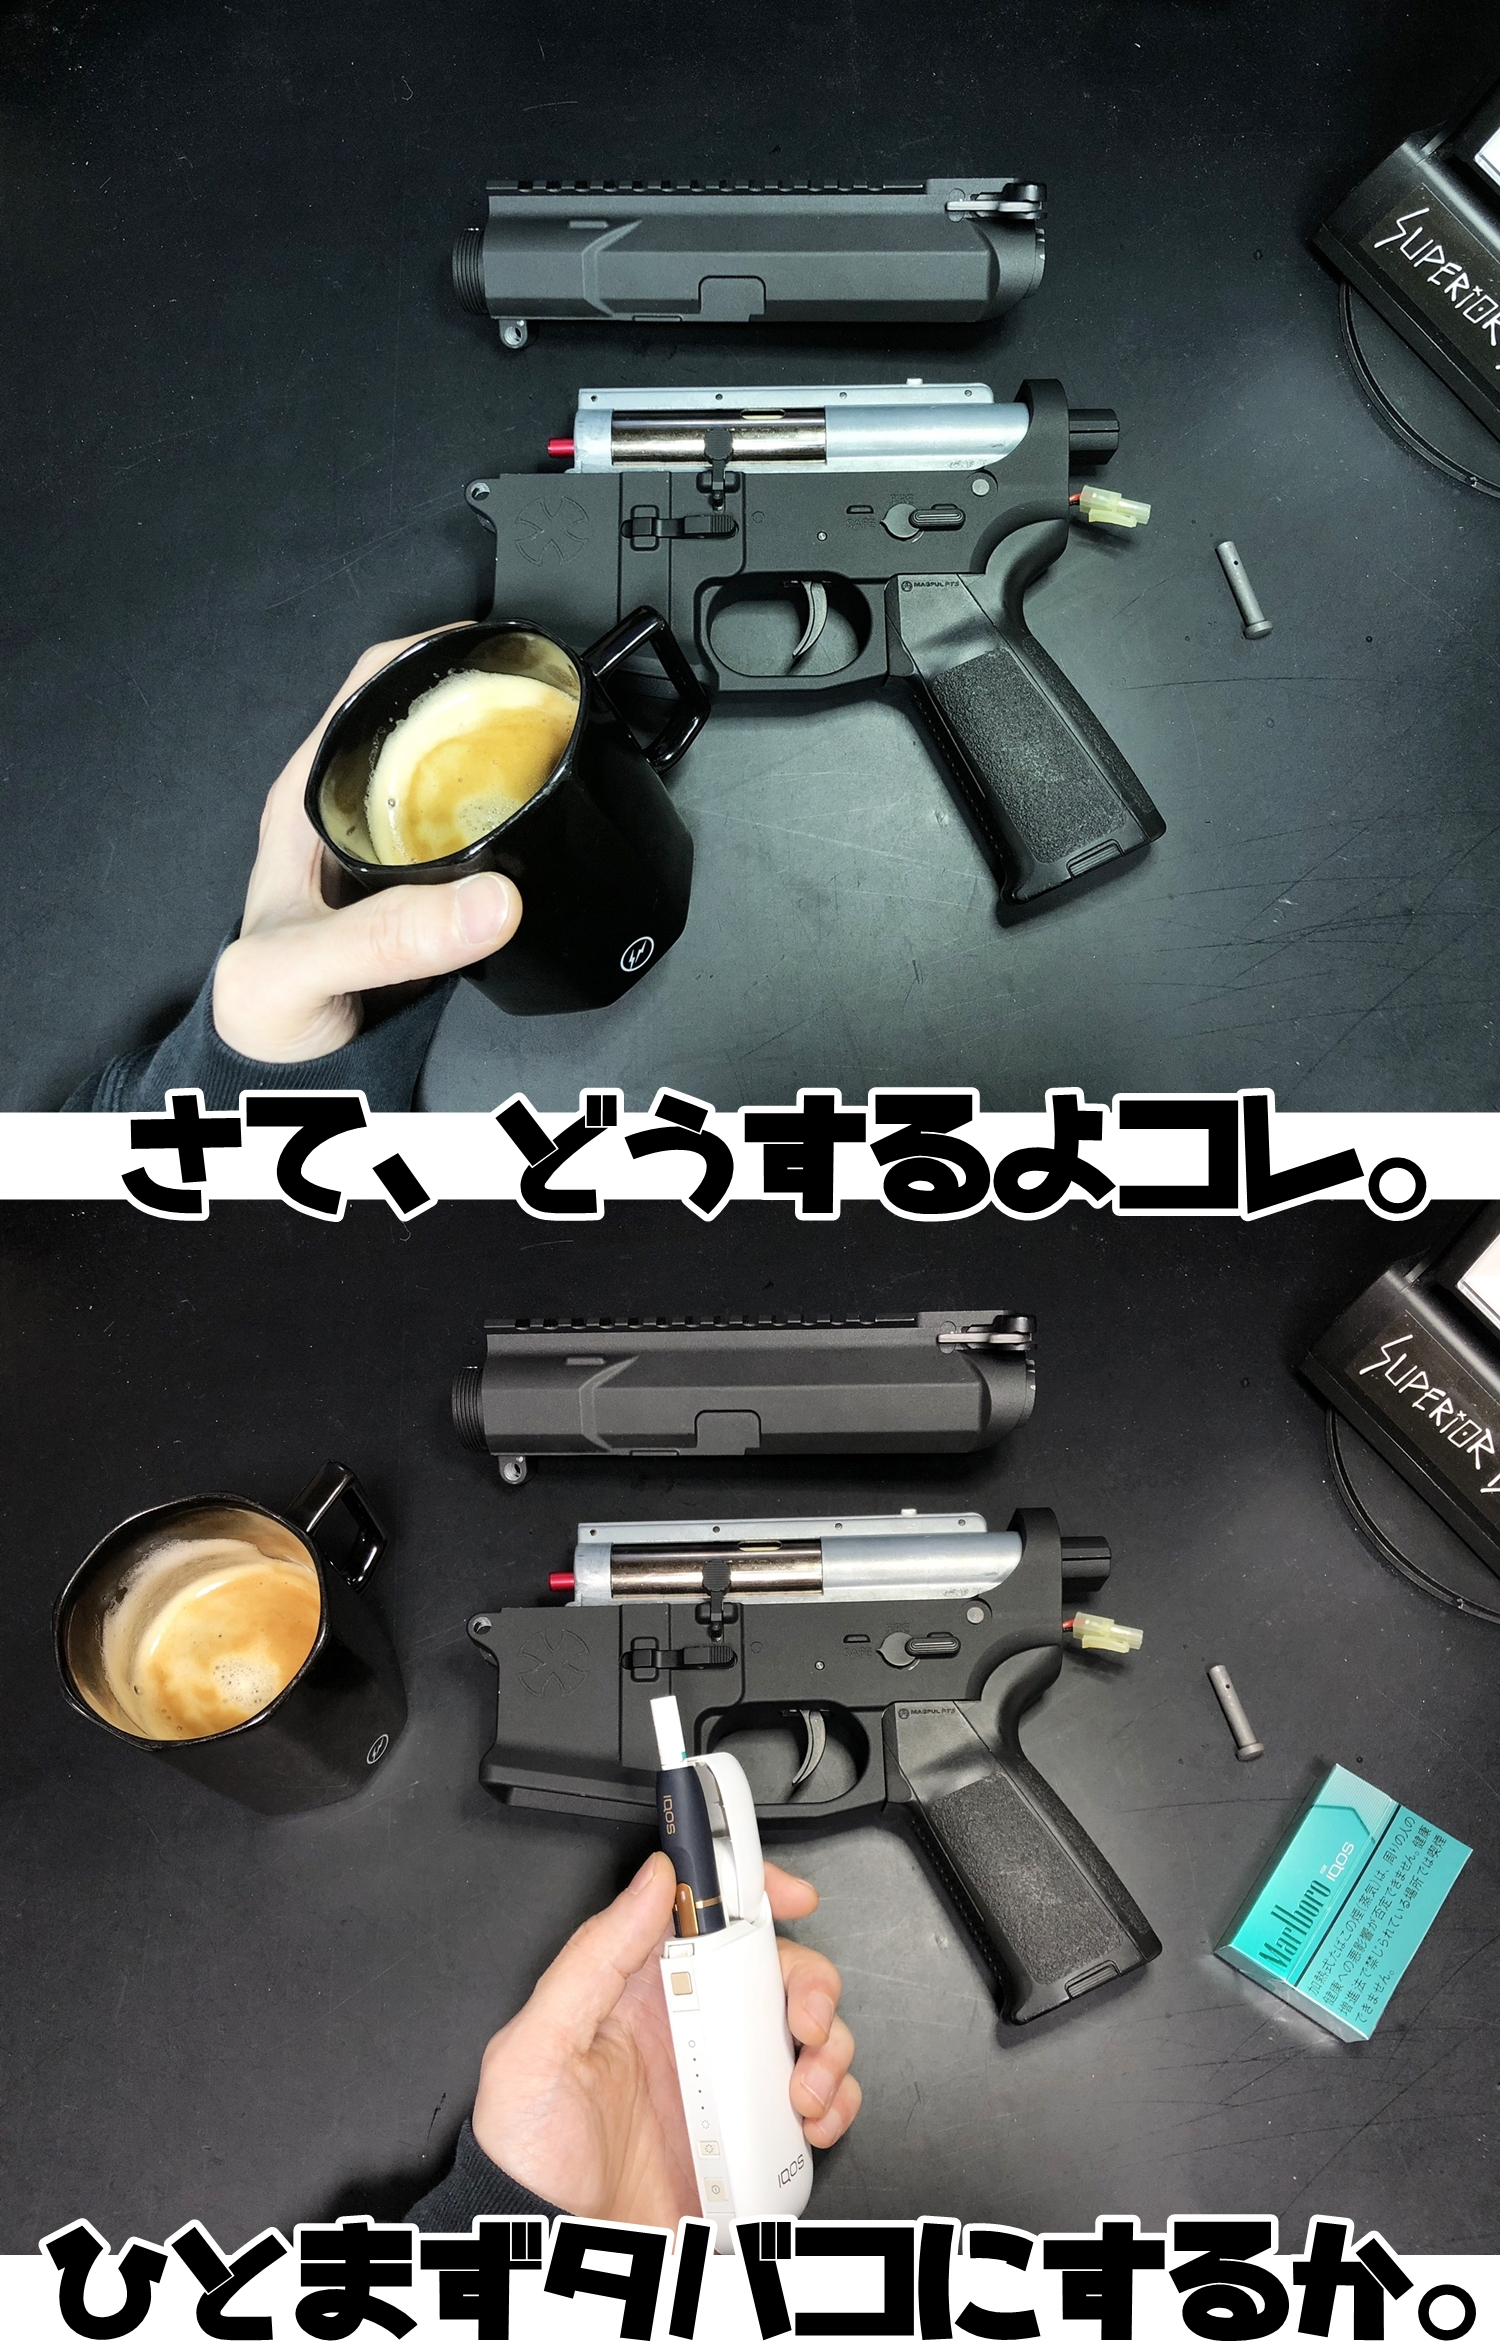 16 NOVESKE GEN3 N4 BY MADBULL!! 『第一弾』 新たにSTD民間系ARを作り始めたいと思います!! STD AR-15 M4 スタンダード 電動ガン マルイ ノベスケ ノベスキー マットブル メタルフレーム 動作テスト 組込 取付 カス